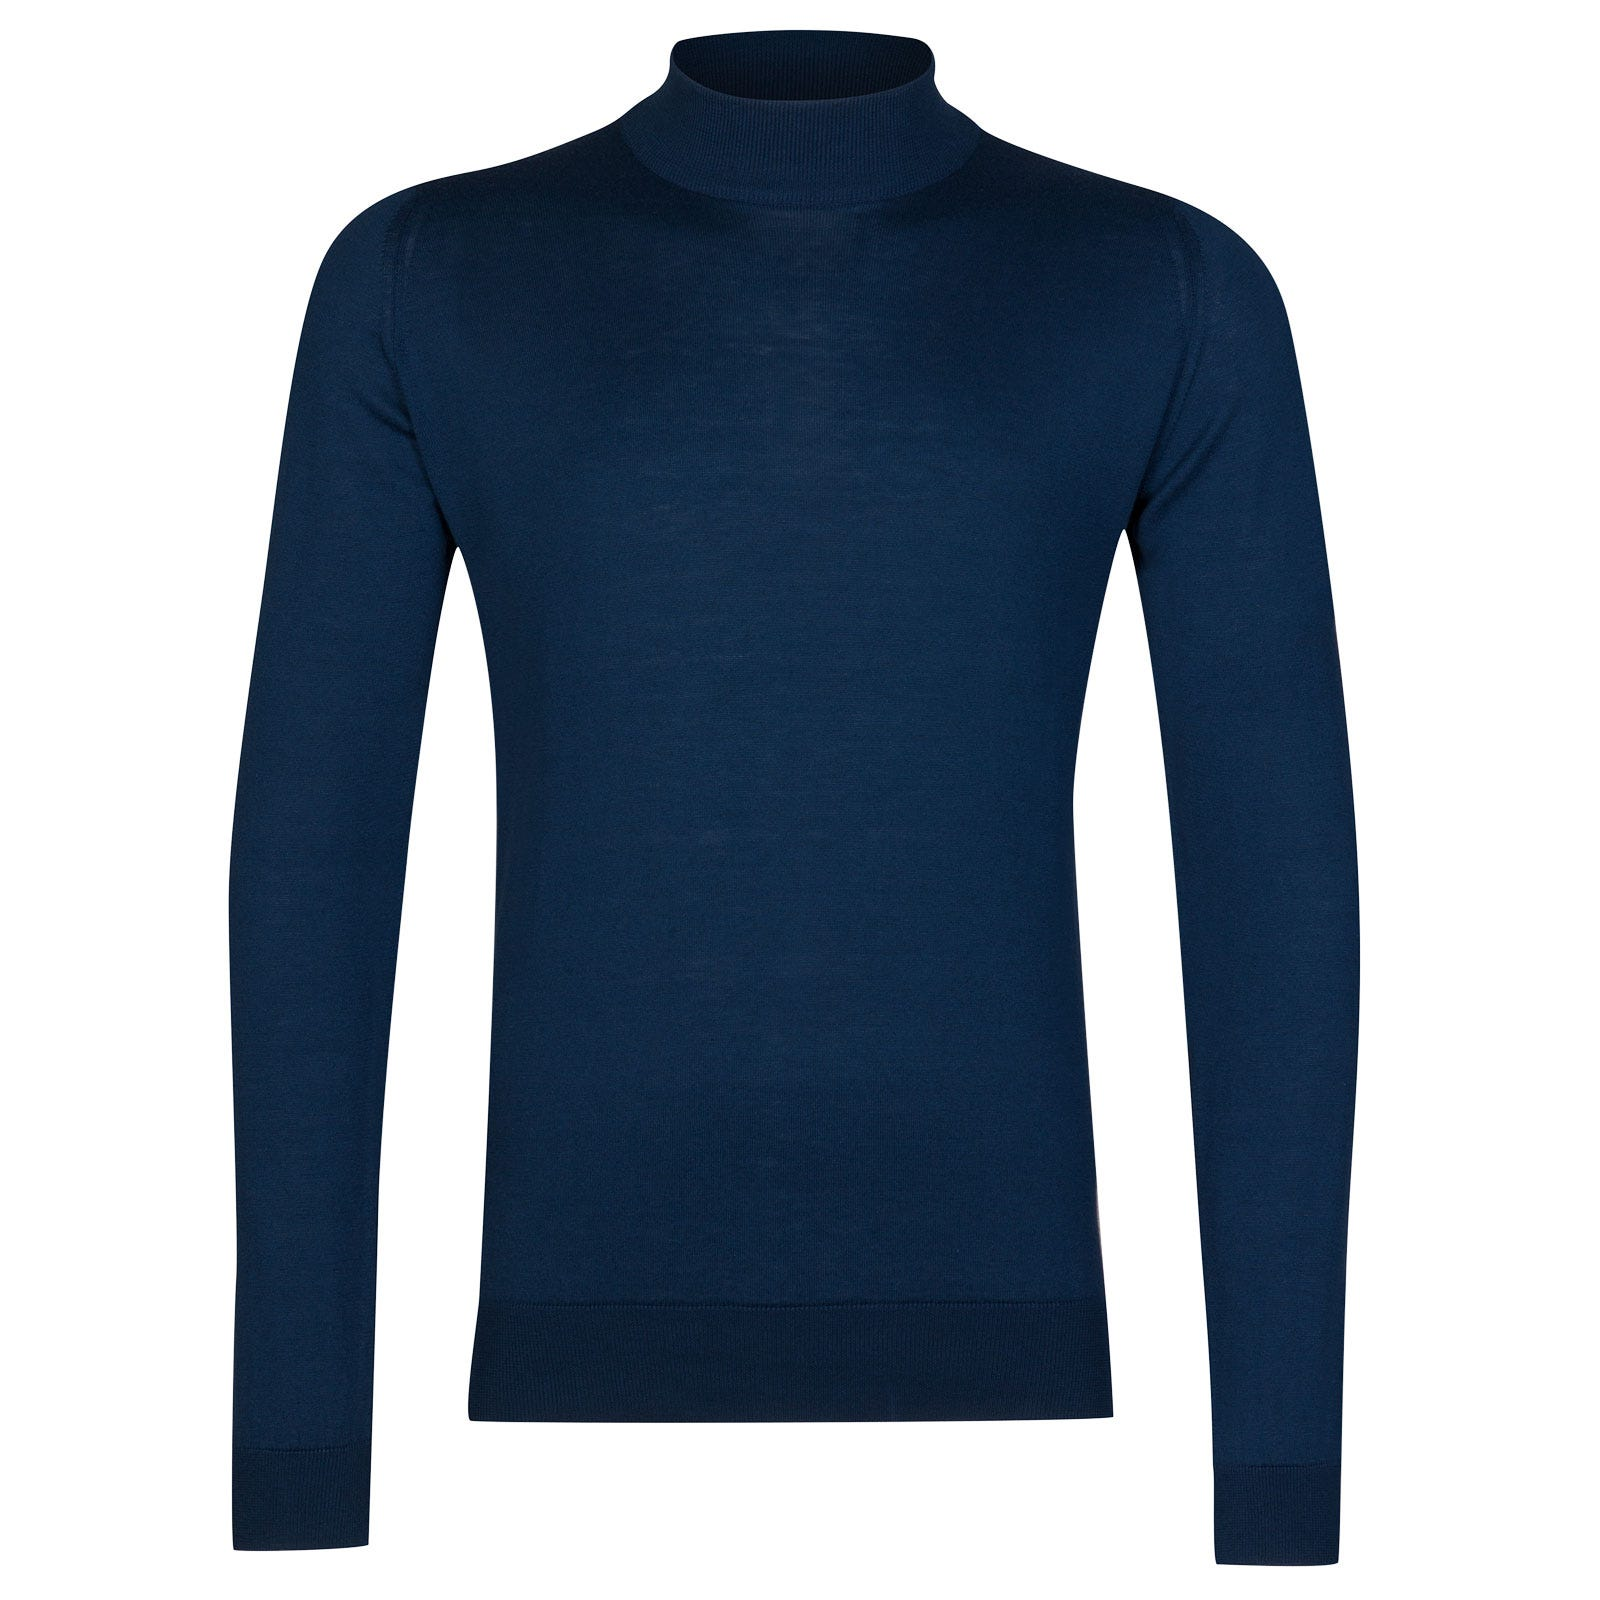 John Smedley Bradgate Sea Island Cotton Pullover in Indigo-M